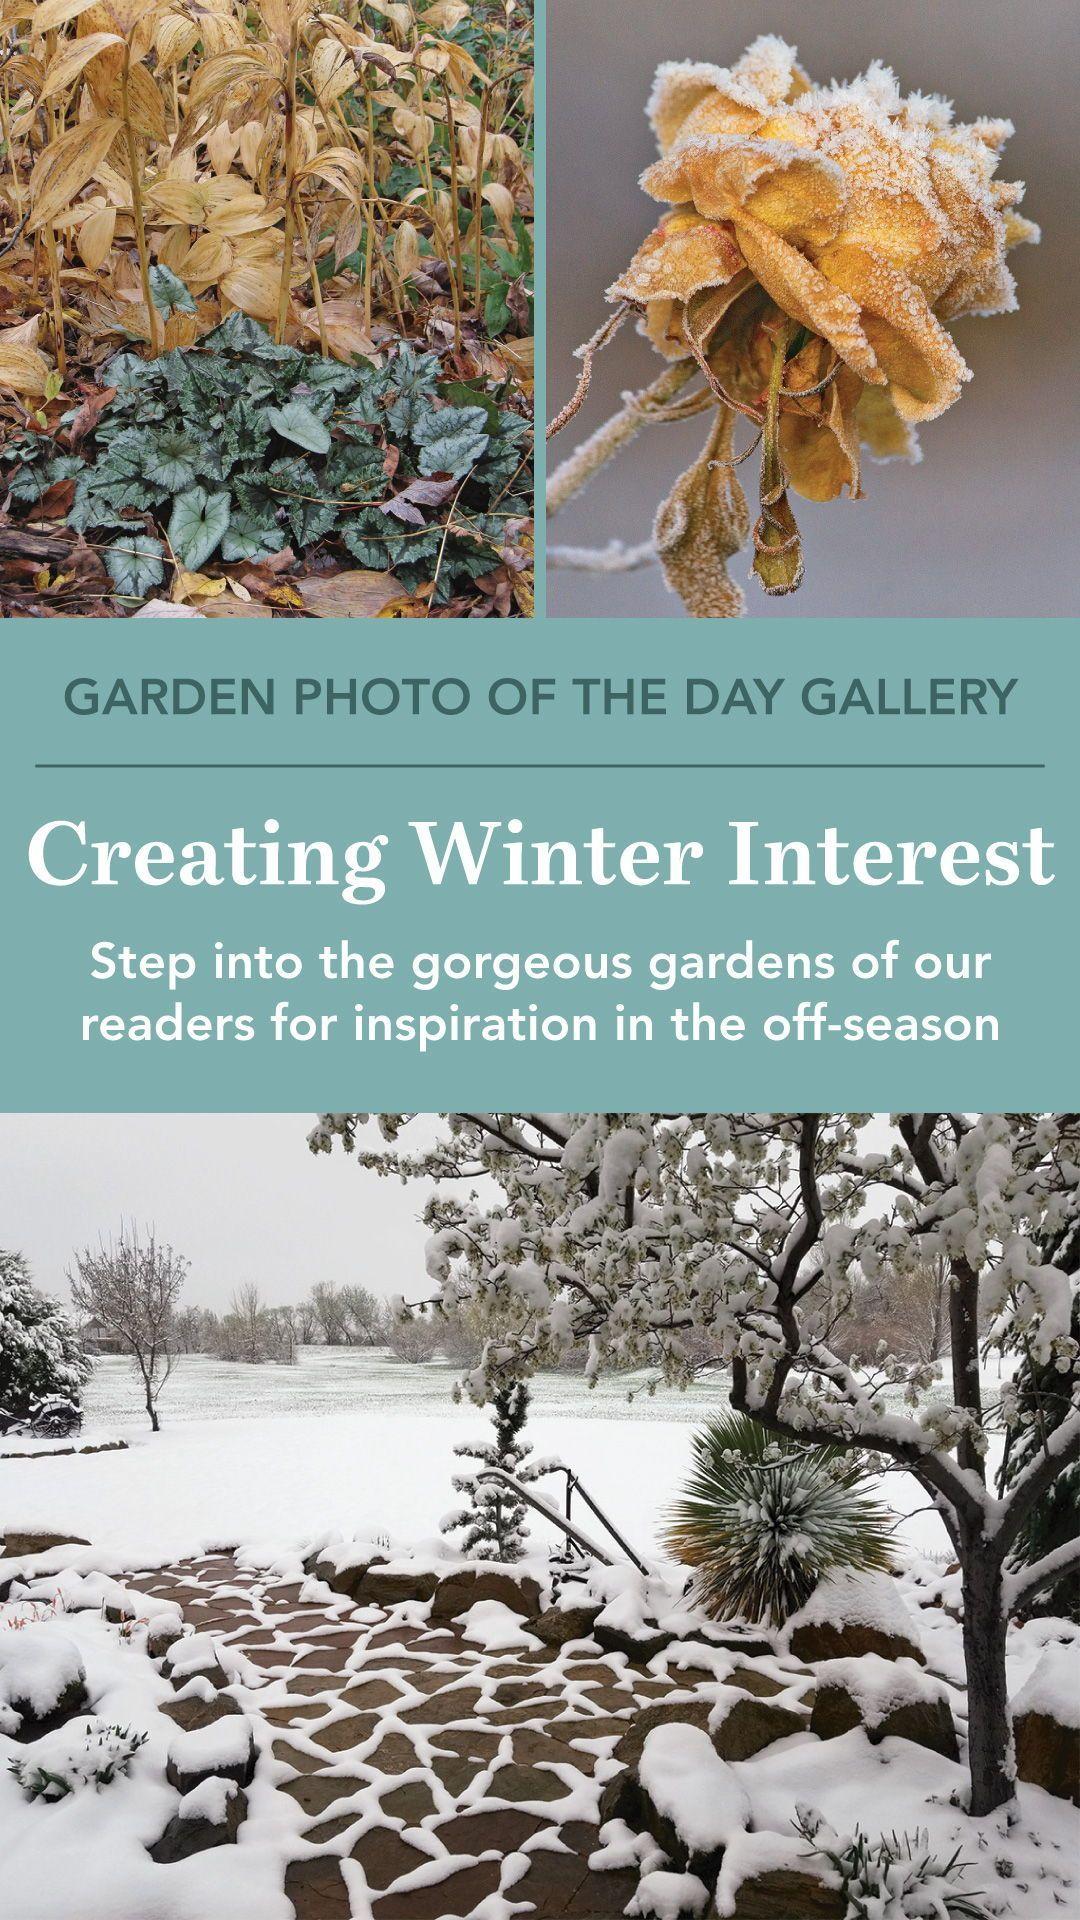 ab610b0cbca7972f6ae36db32e4cbbf9 - How Do Gardeners Make Money In Winter